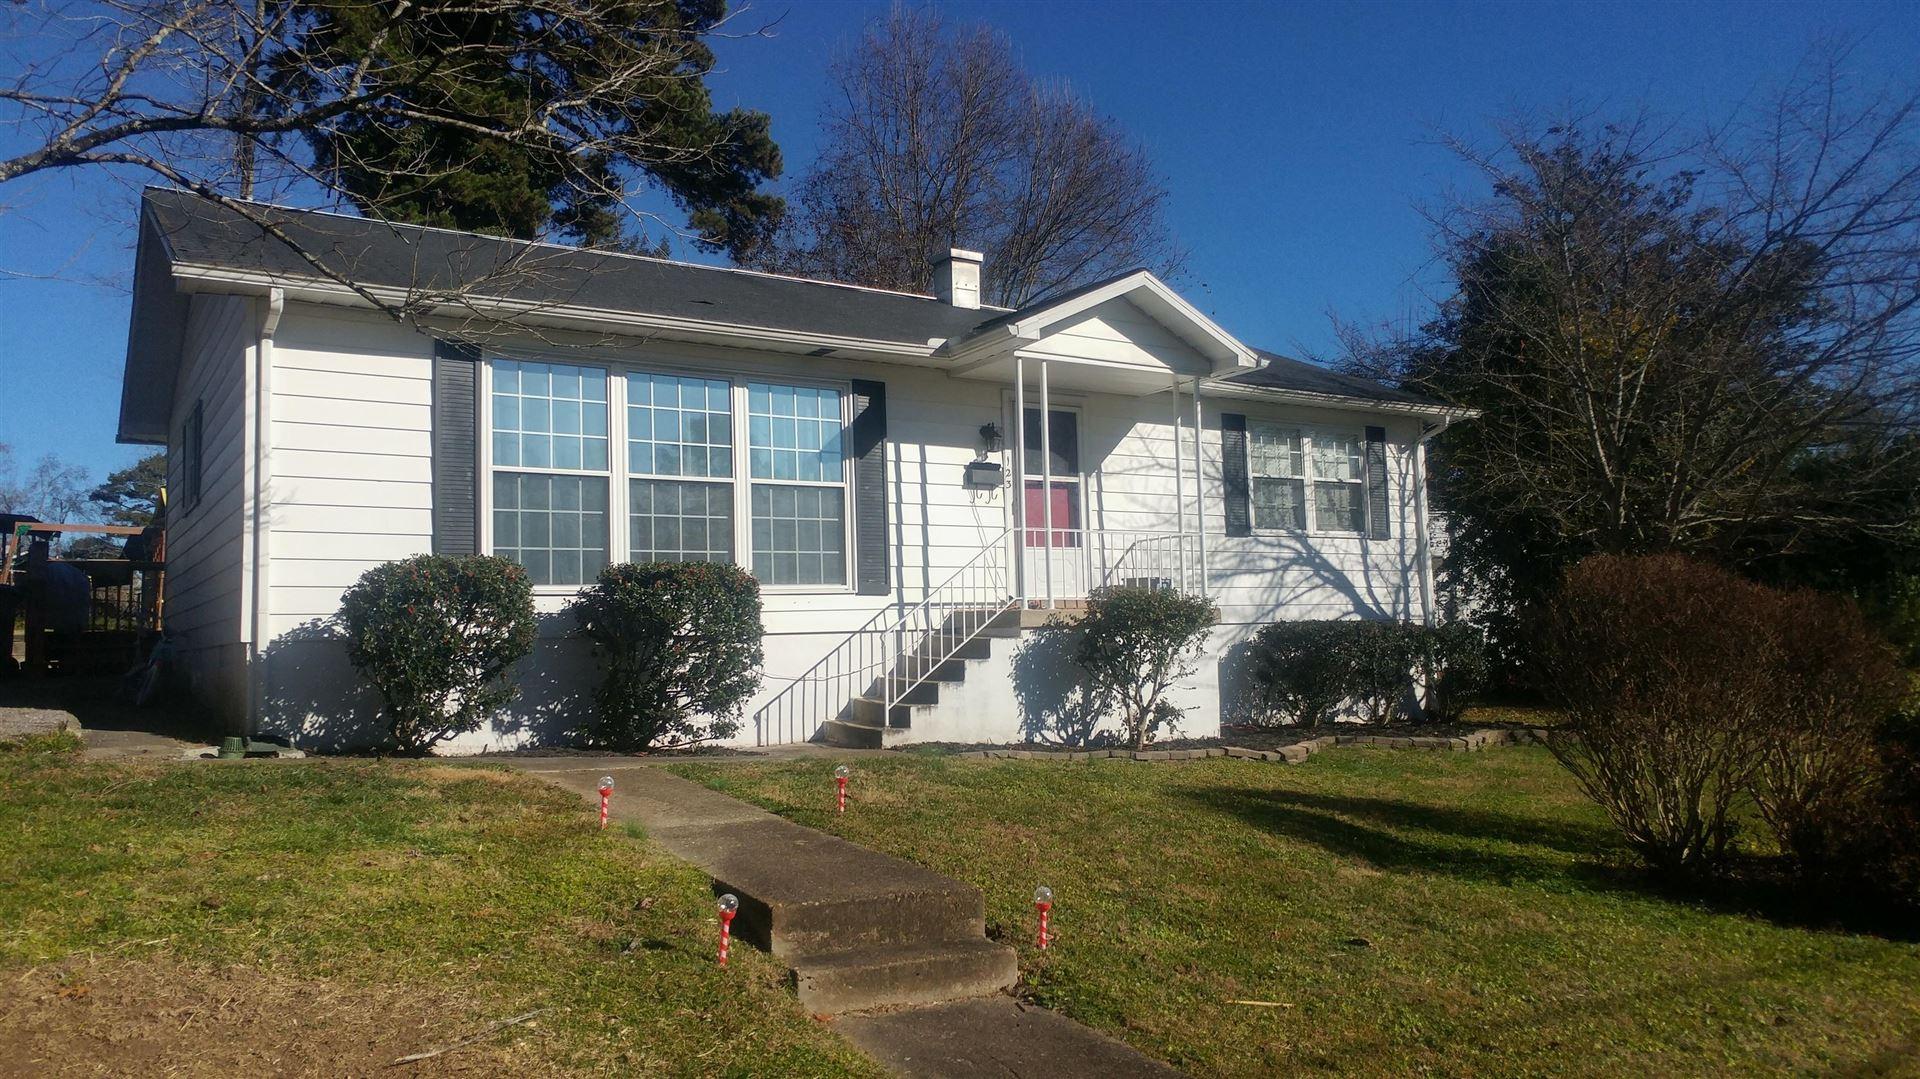 Photo of 123 Andover Circle, Oak Ridge, TN 37830 (MLS # 1138738)